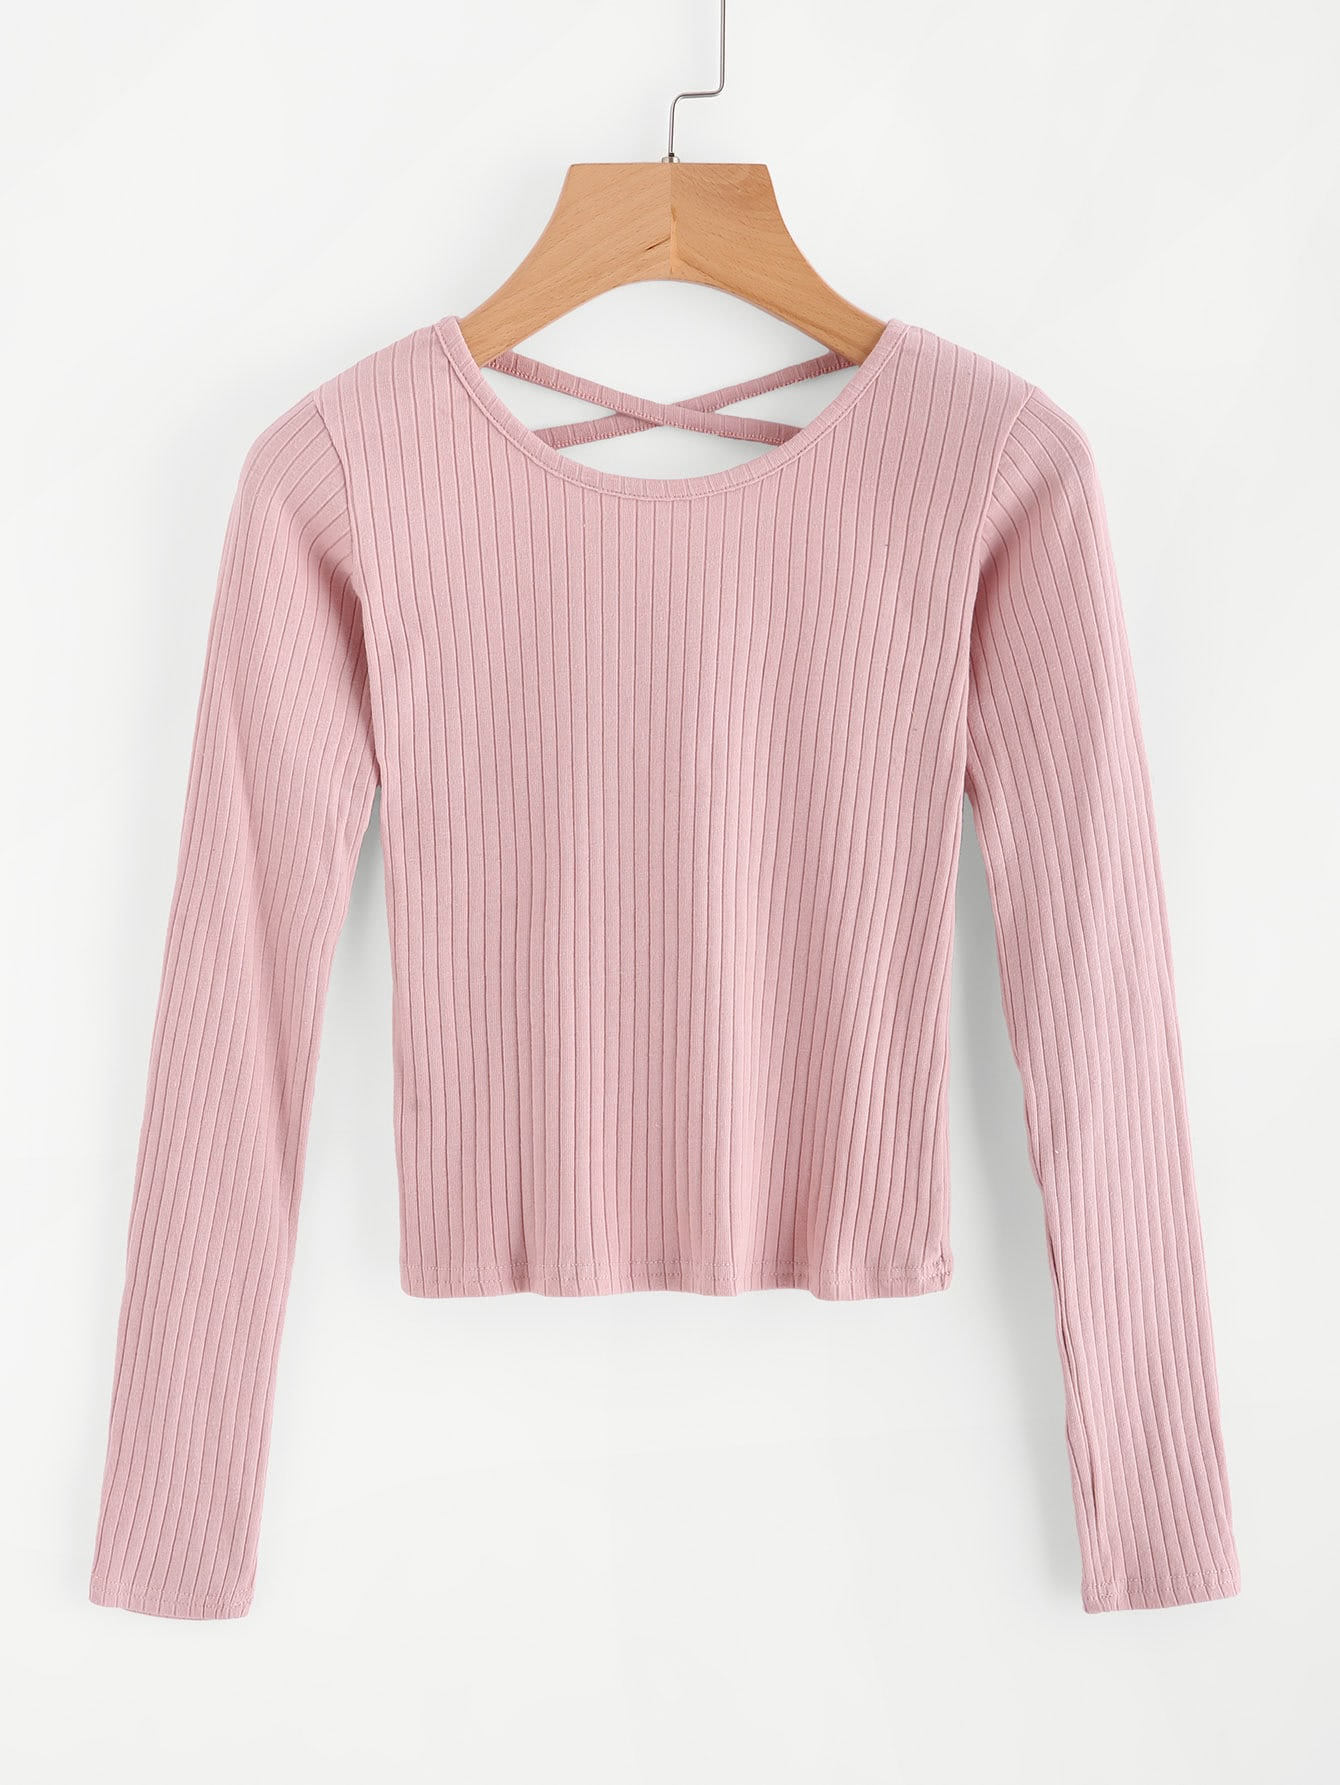 Criss Cross Back Ribbed SweaterFor Women-romwe